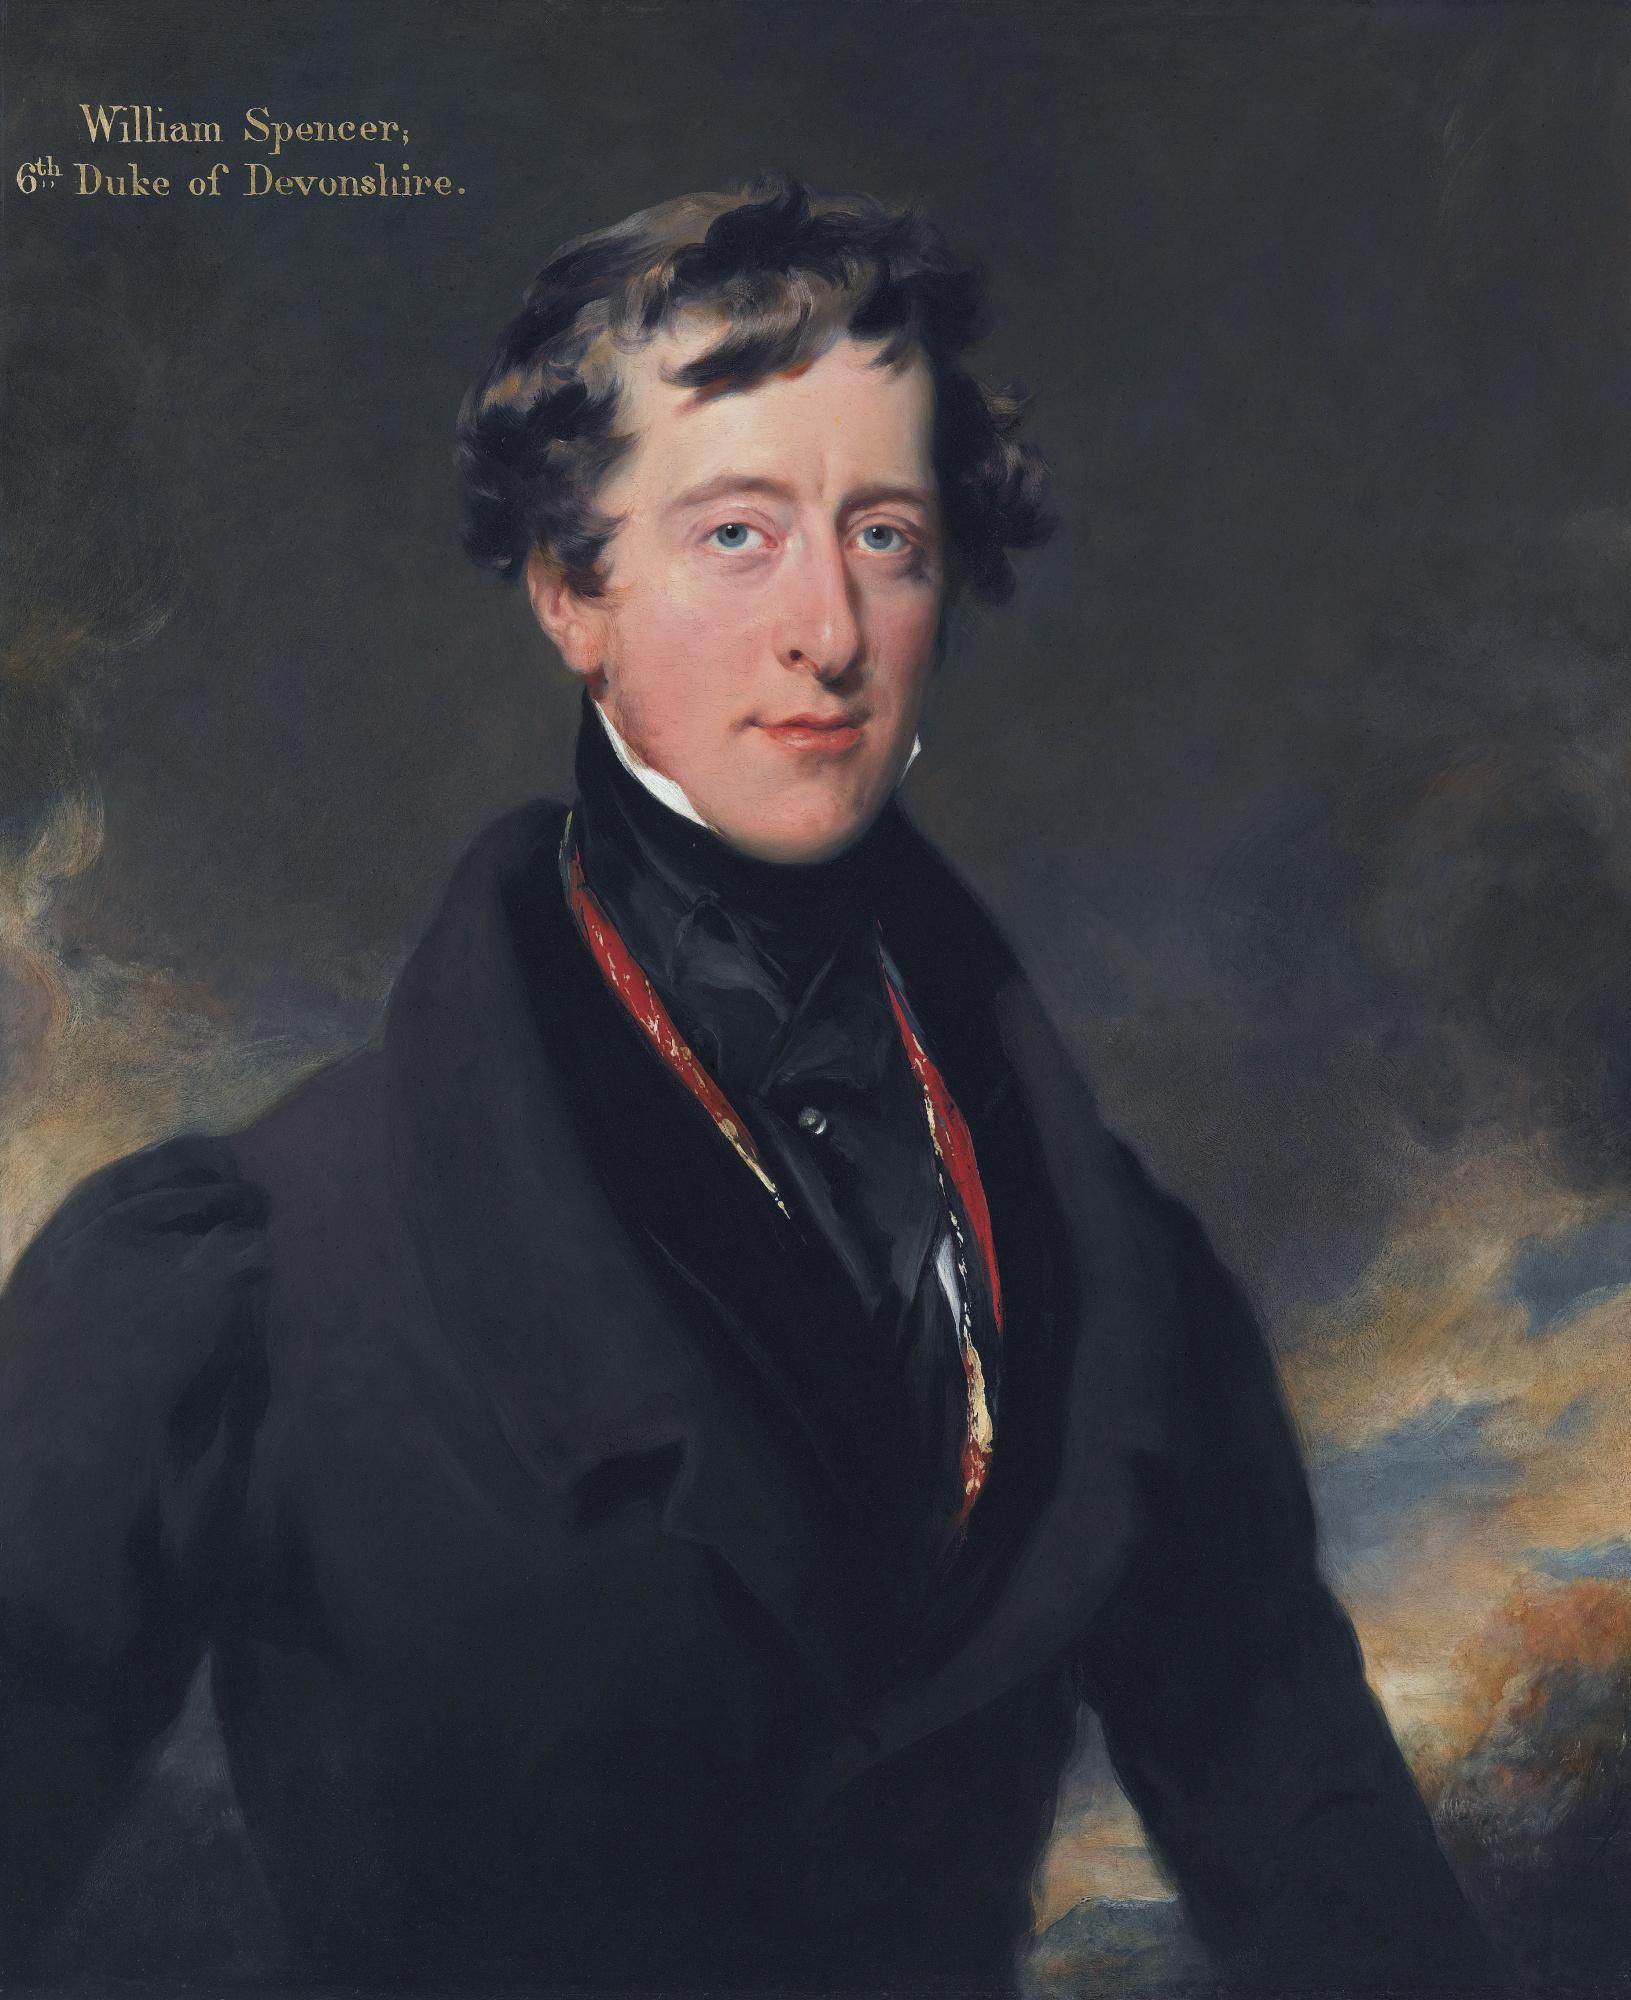 William Cavendish, 6th Duke of Devonshire - Wikipedia